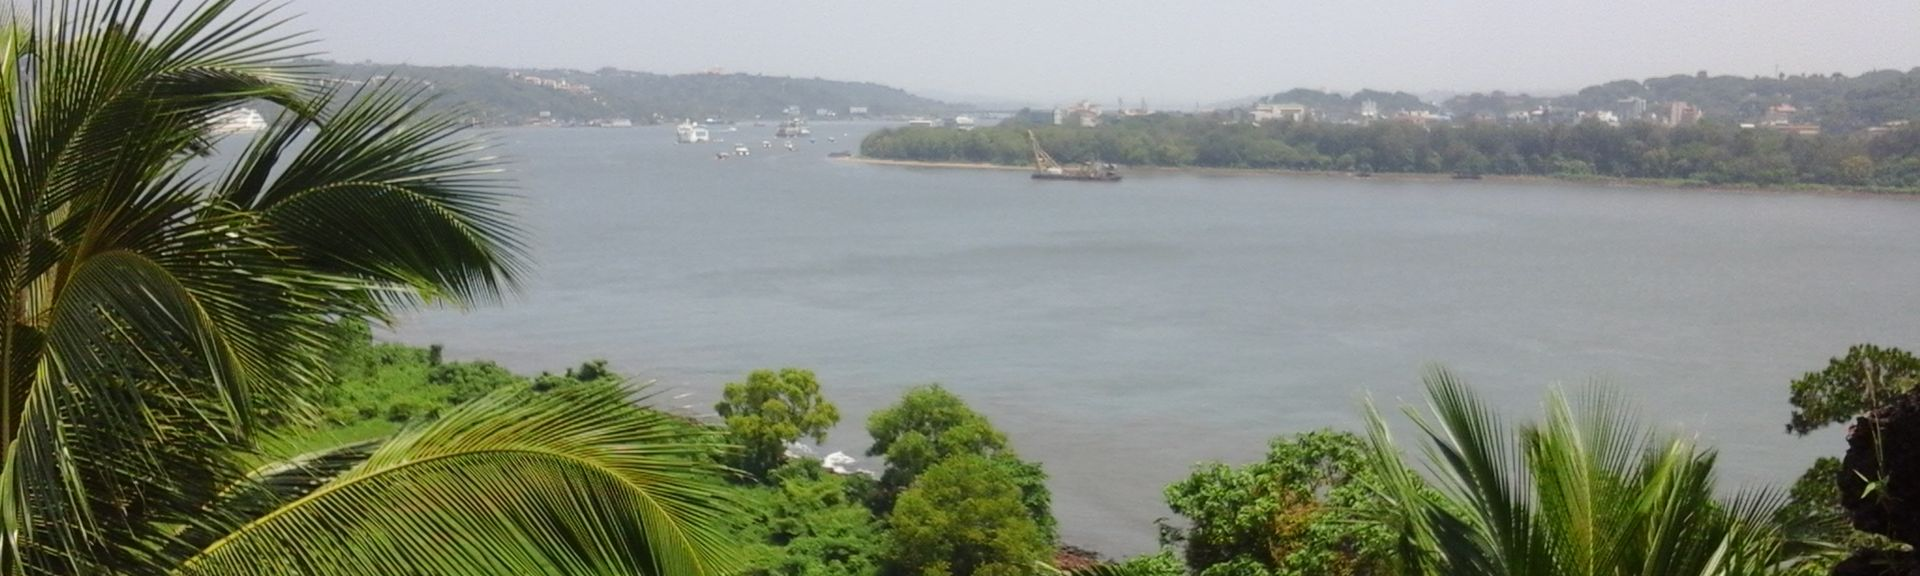 Colvale, Goa, Intia